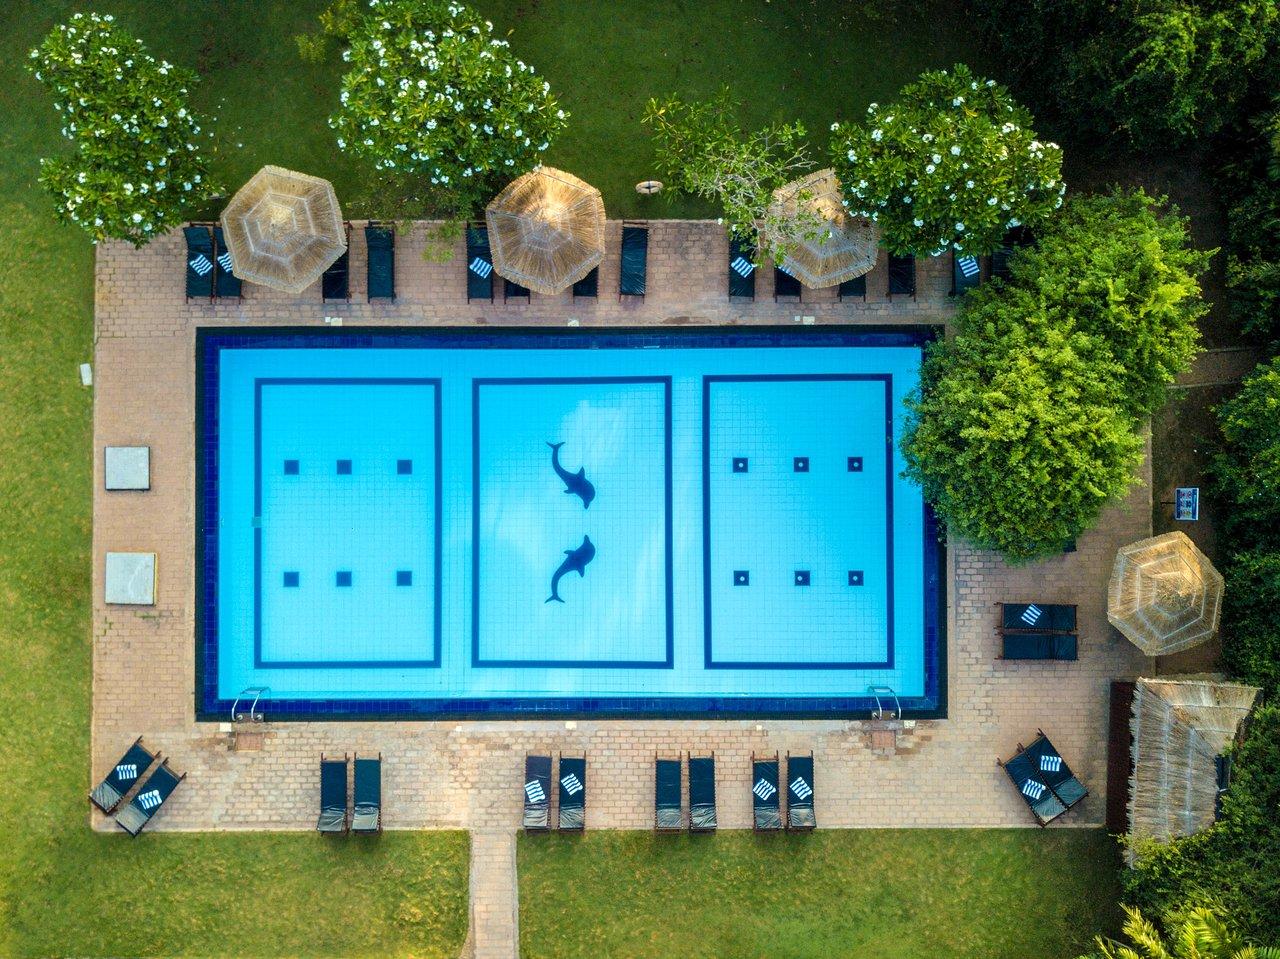 camellia resort and spa 58 9 5 updated 2019 prices hotel rh tripadvisor com